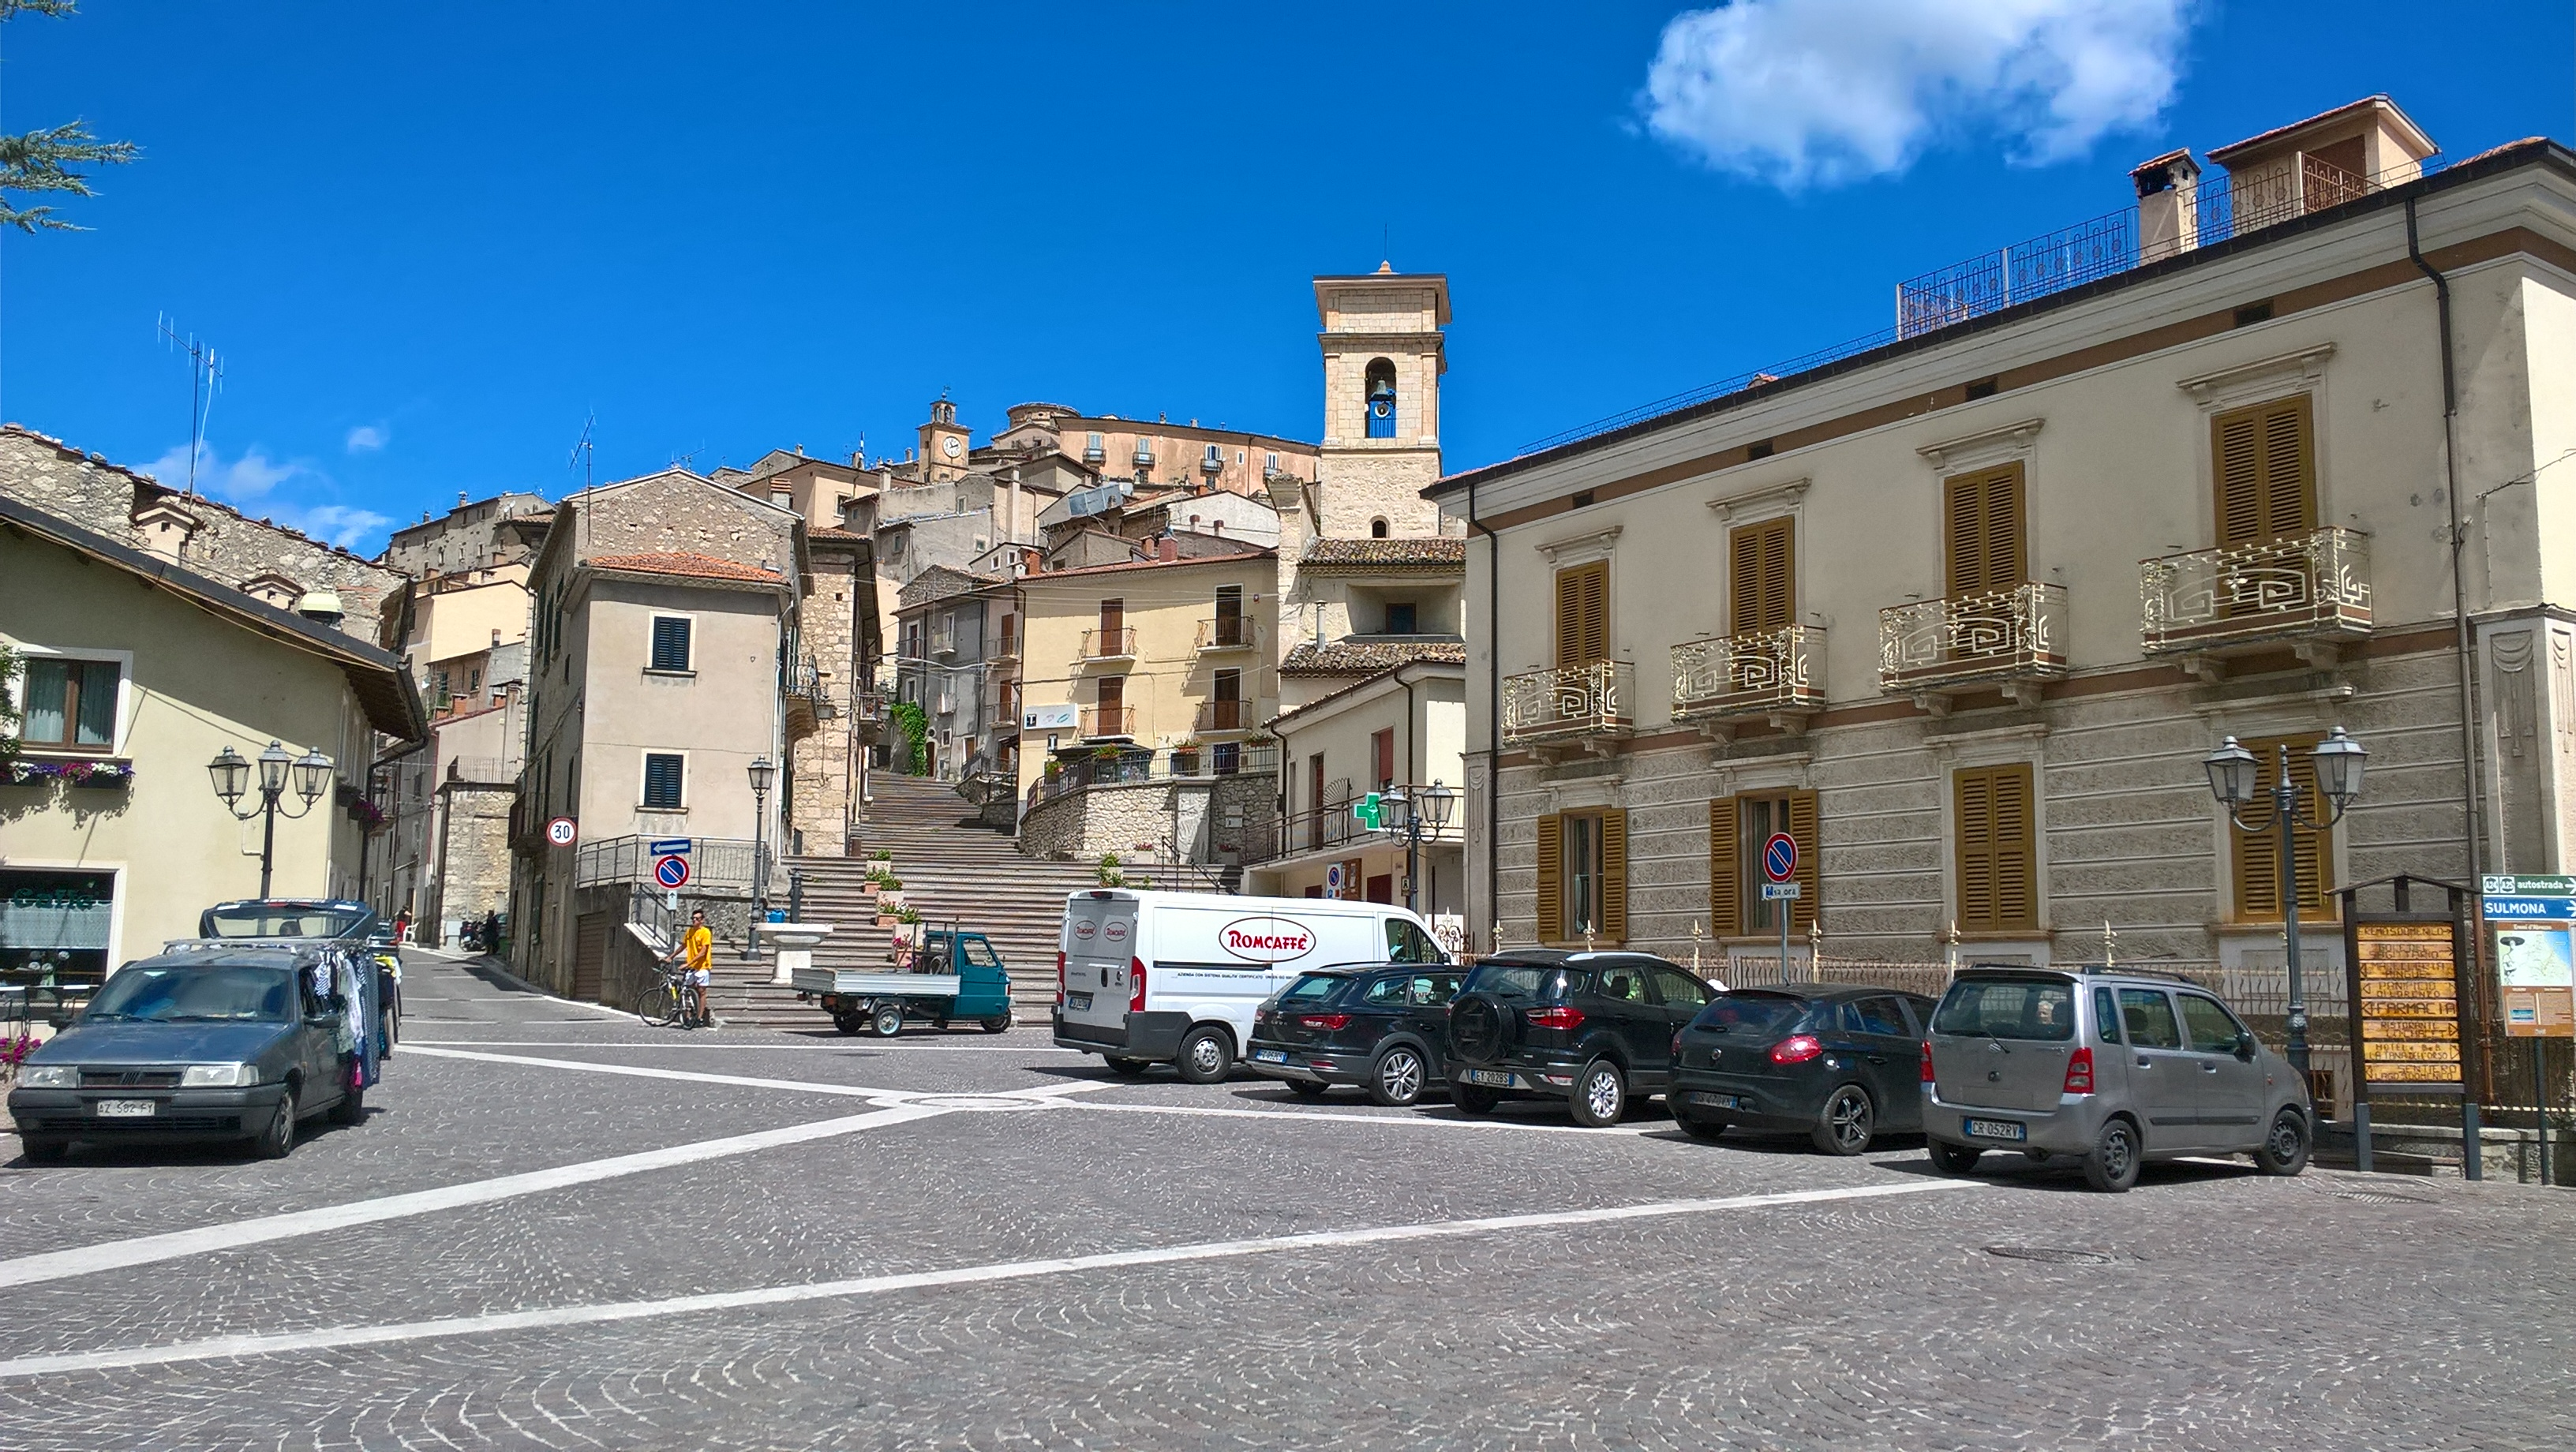 Old Town Hall, Villalago